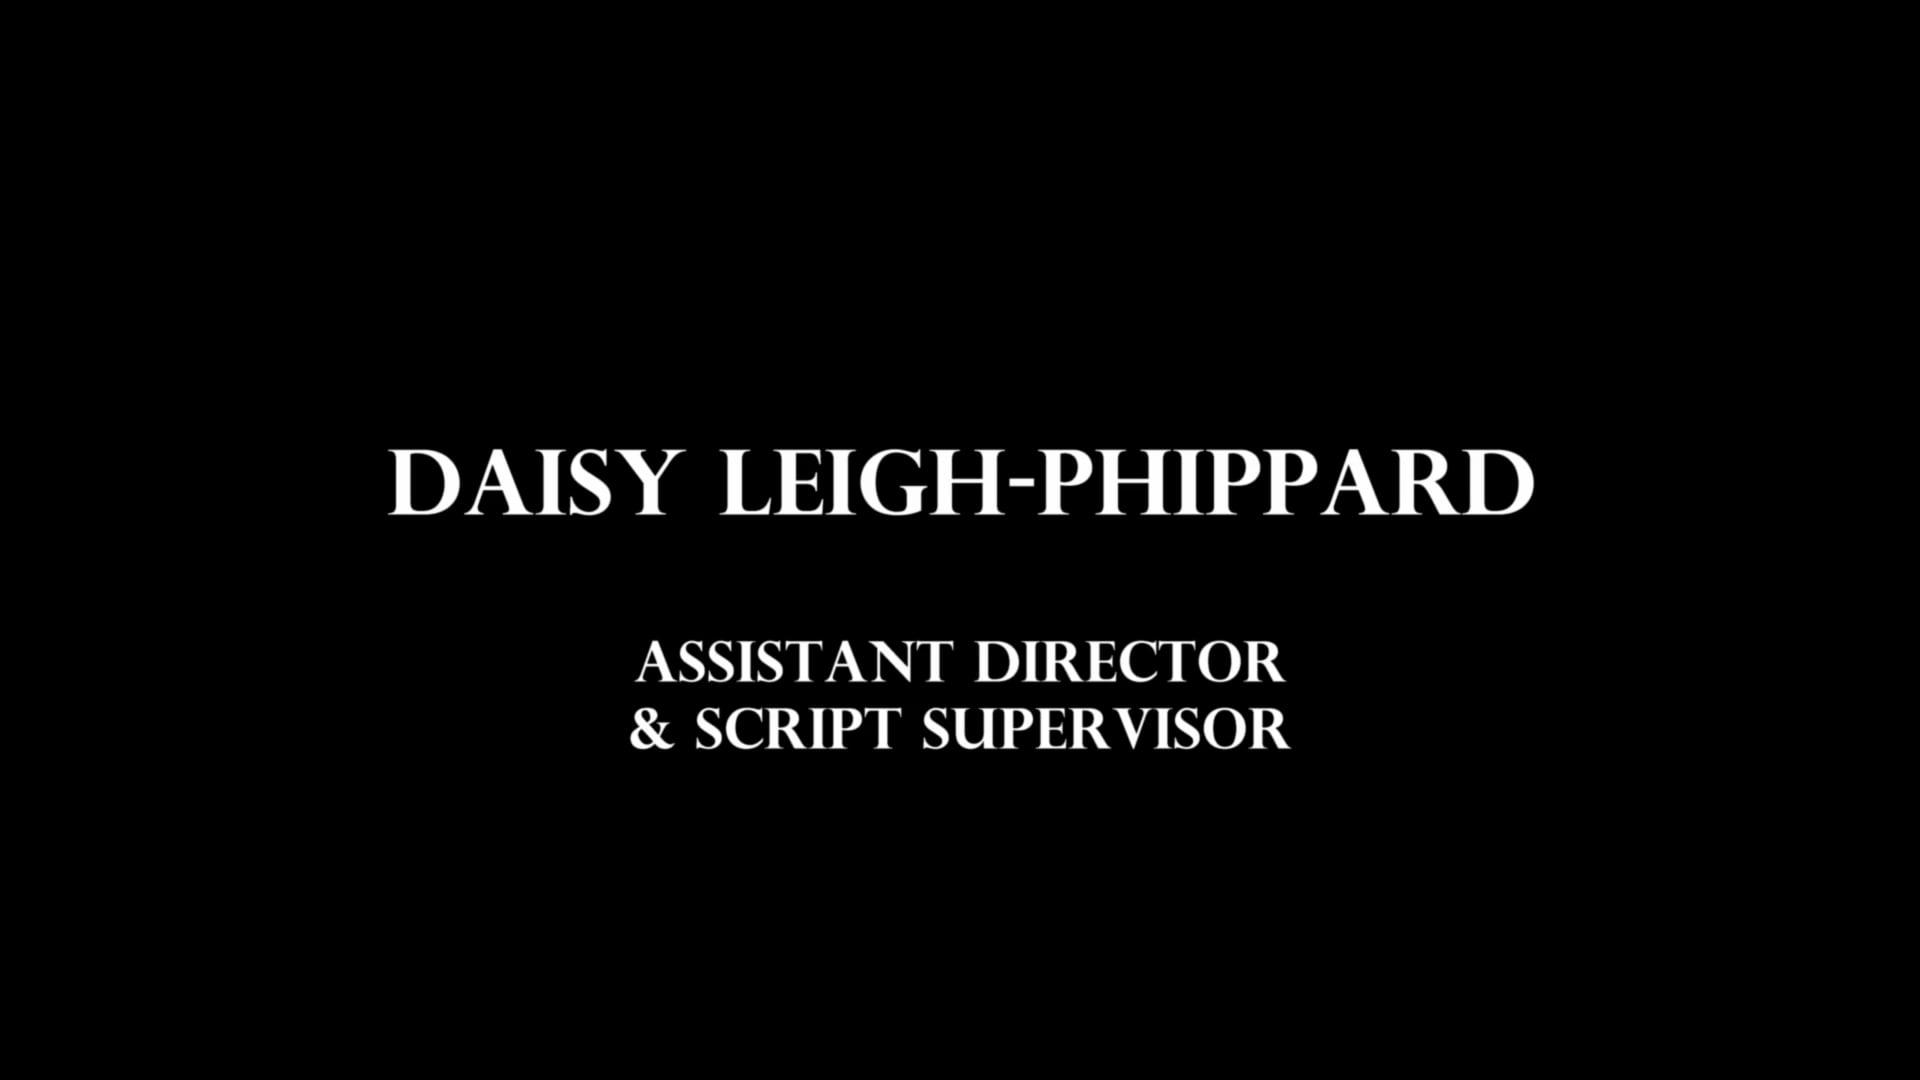 Daisy Leigh-Phippard - Assistant Director/Script Supervisor Showreel